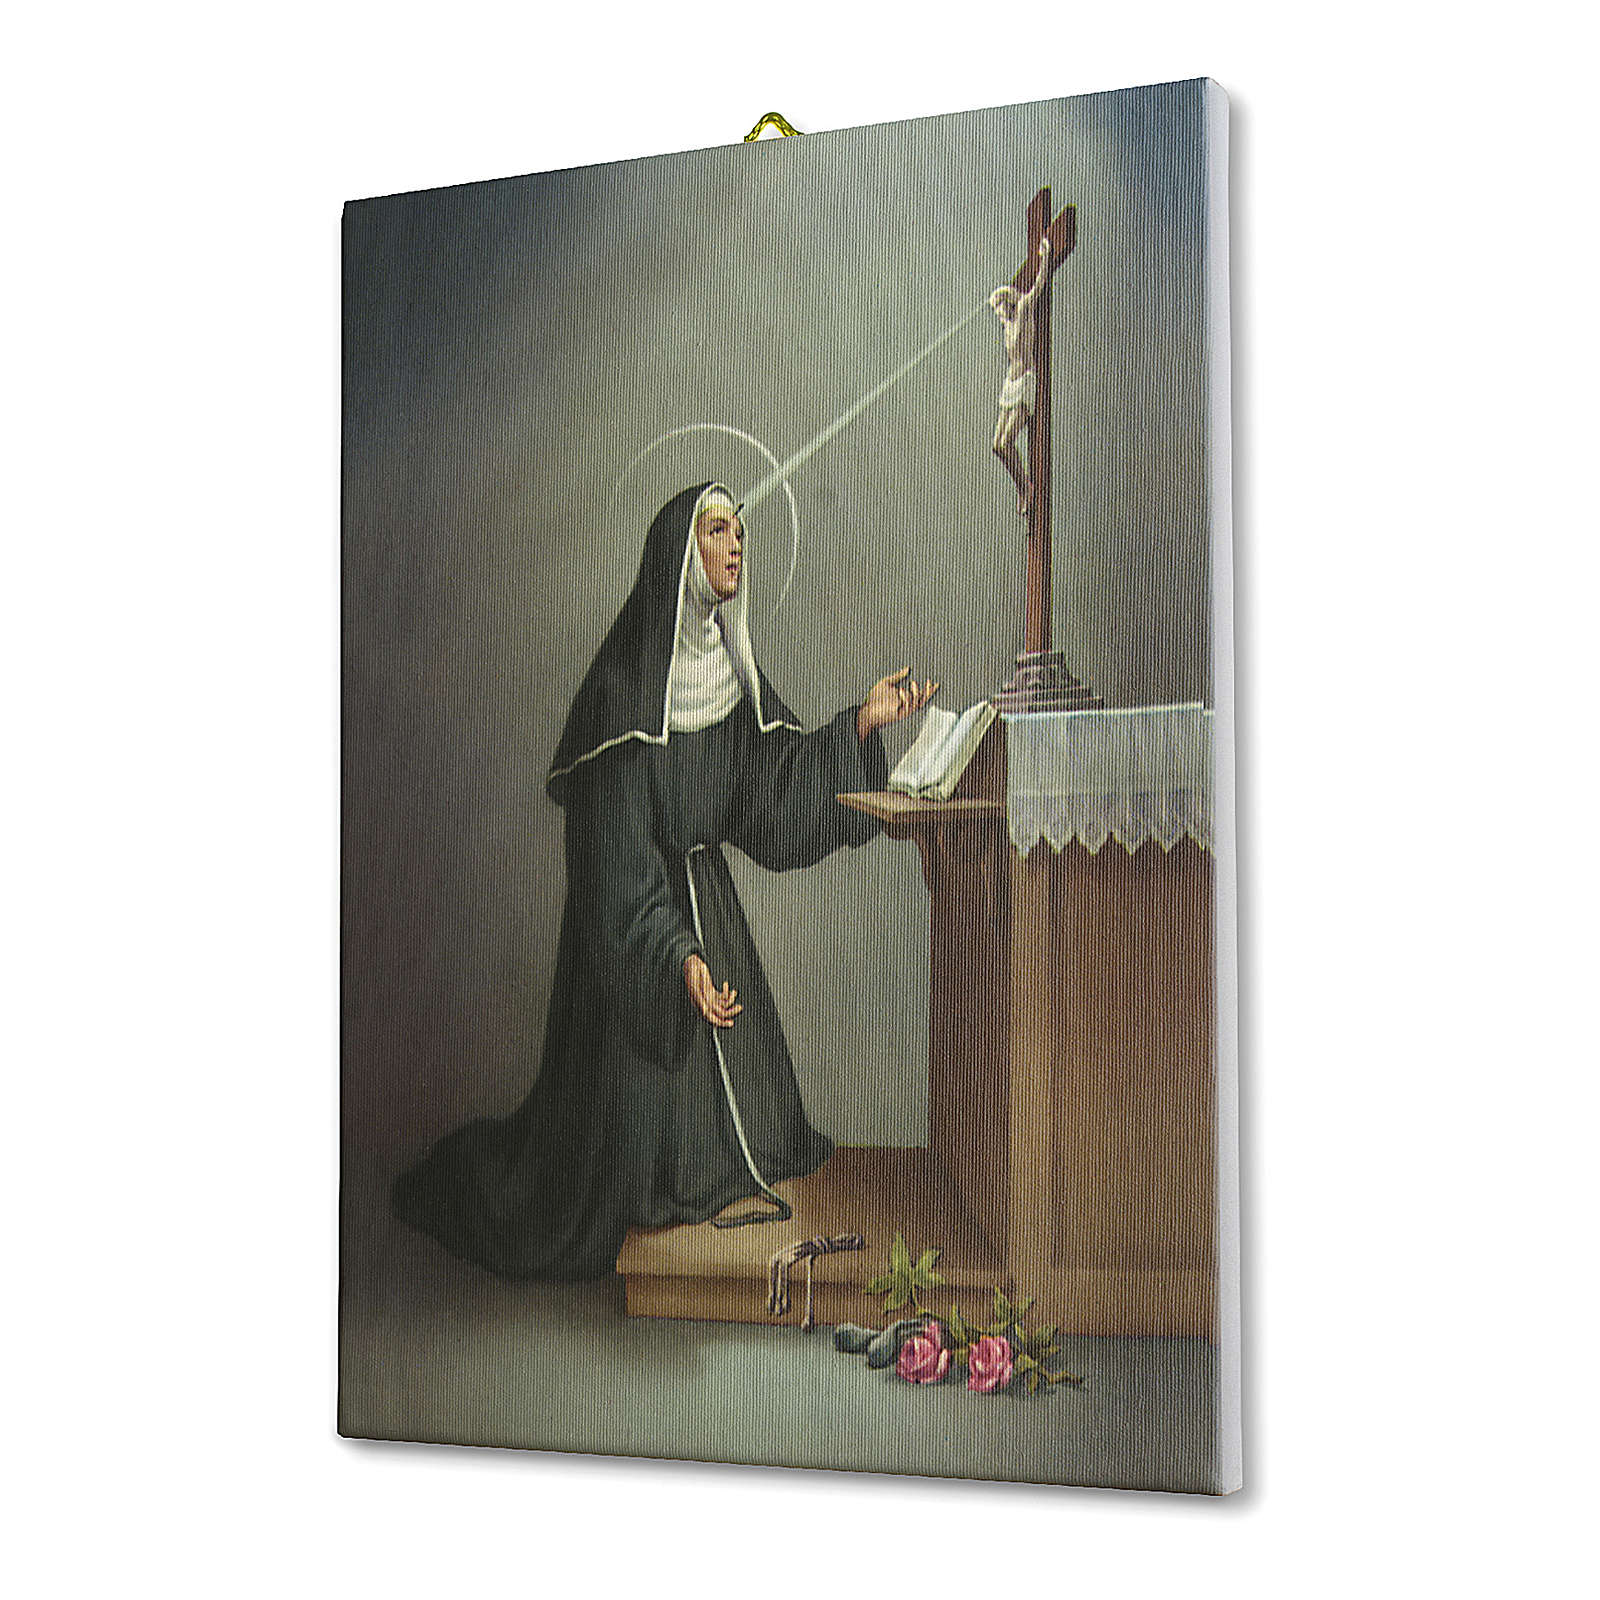 Tela pittorica quadro Santa Rita da Cascia 40x30 cm 3